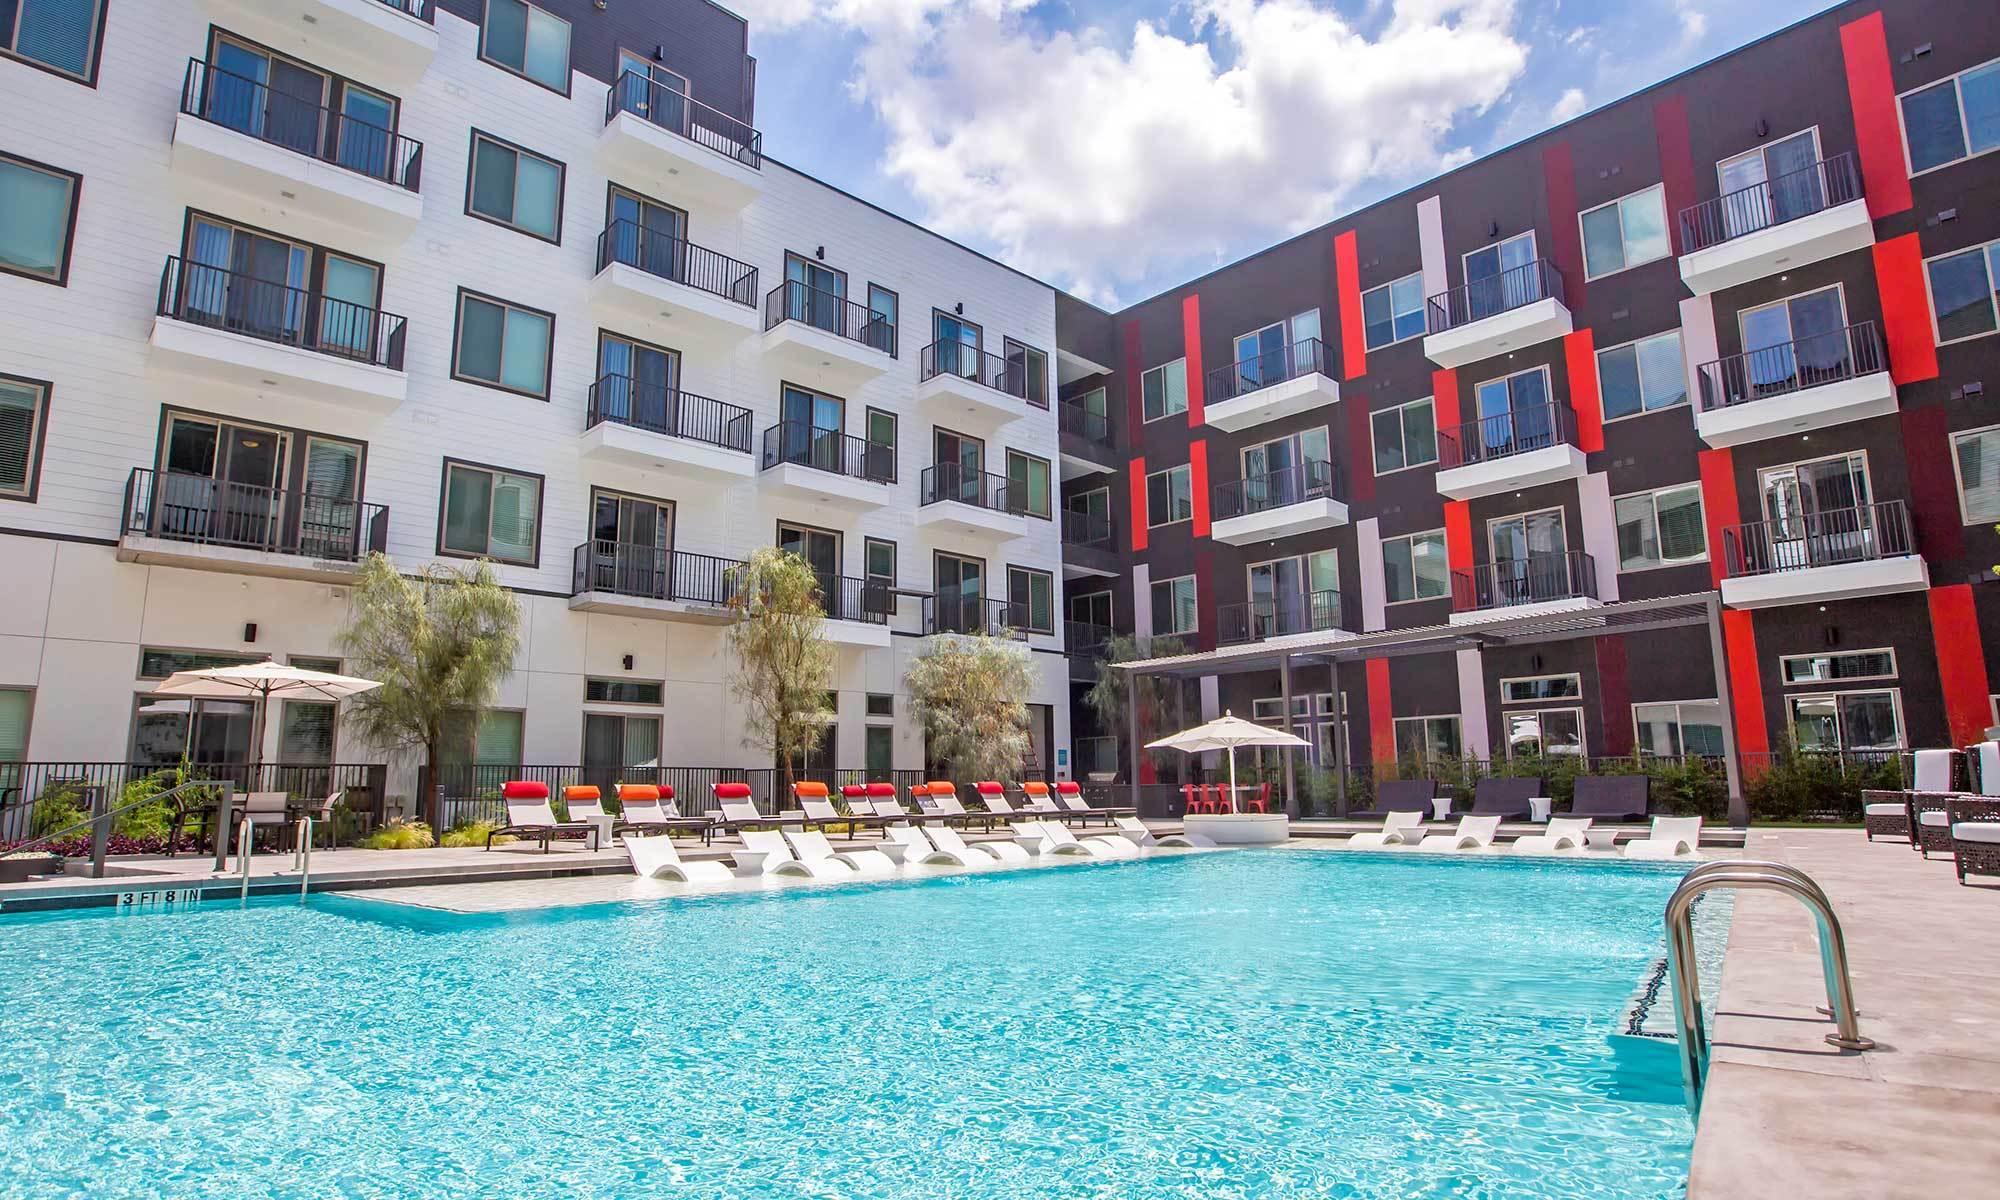 Apartment Rentals In Austin TX Marq On Burnet - 4 bedroom apartments austin tx